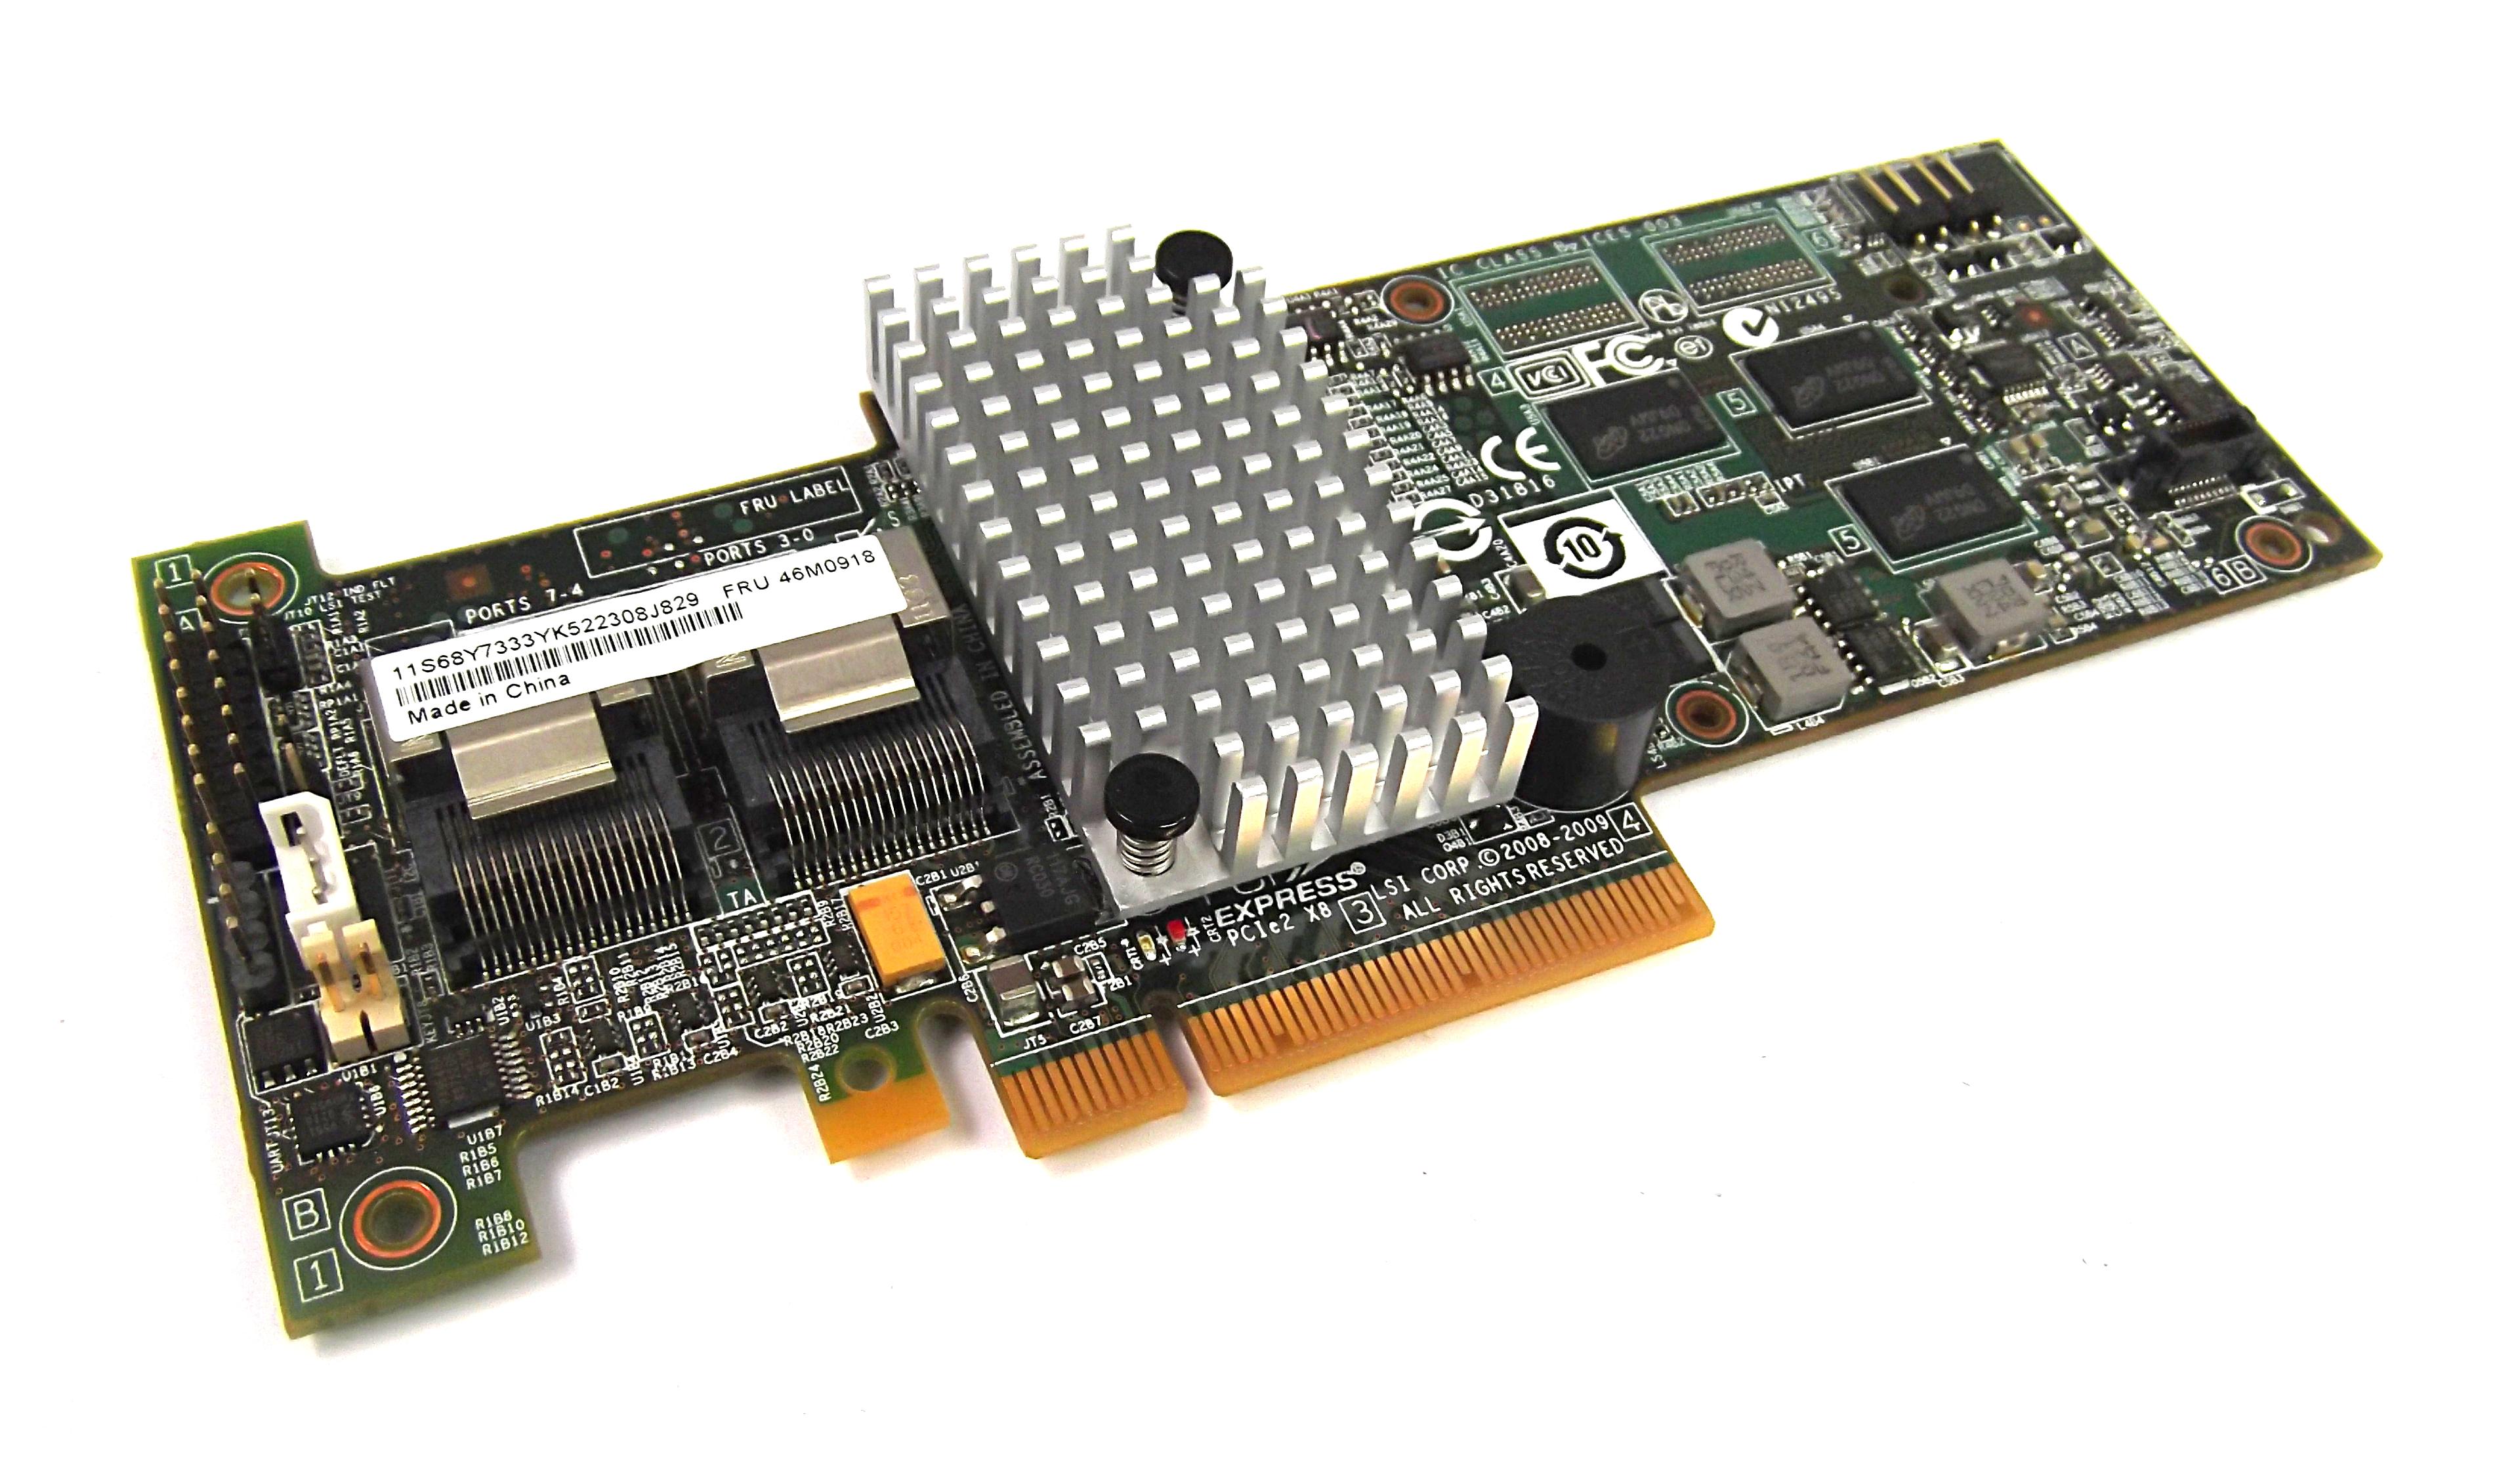 IBM 46M0918 System x3550 M2 X3650 M3 PCI-e SAS/ SATA Controller Card